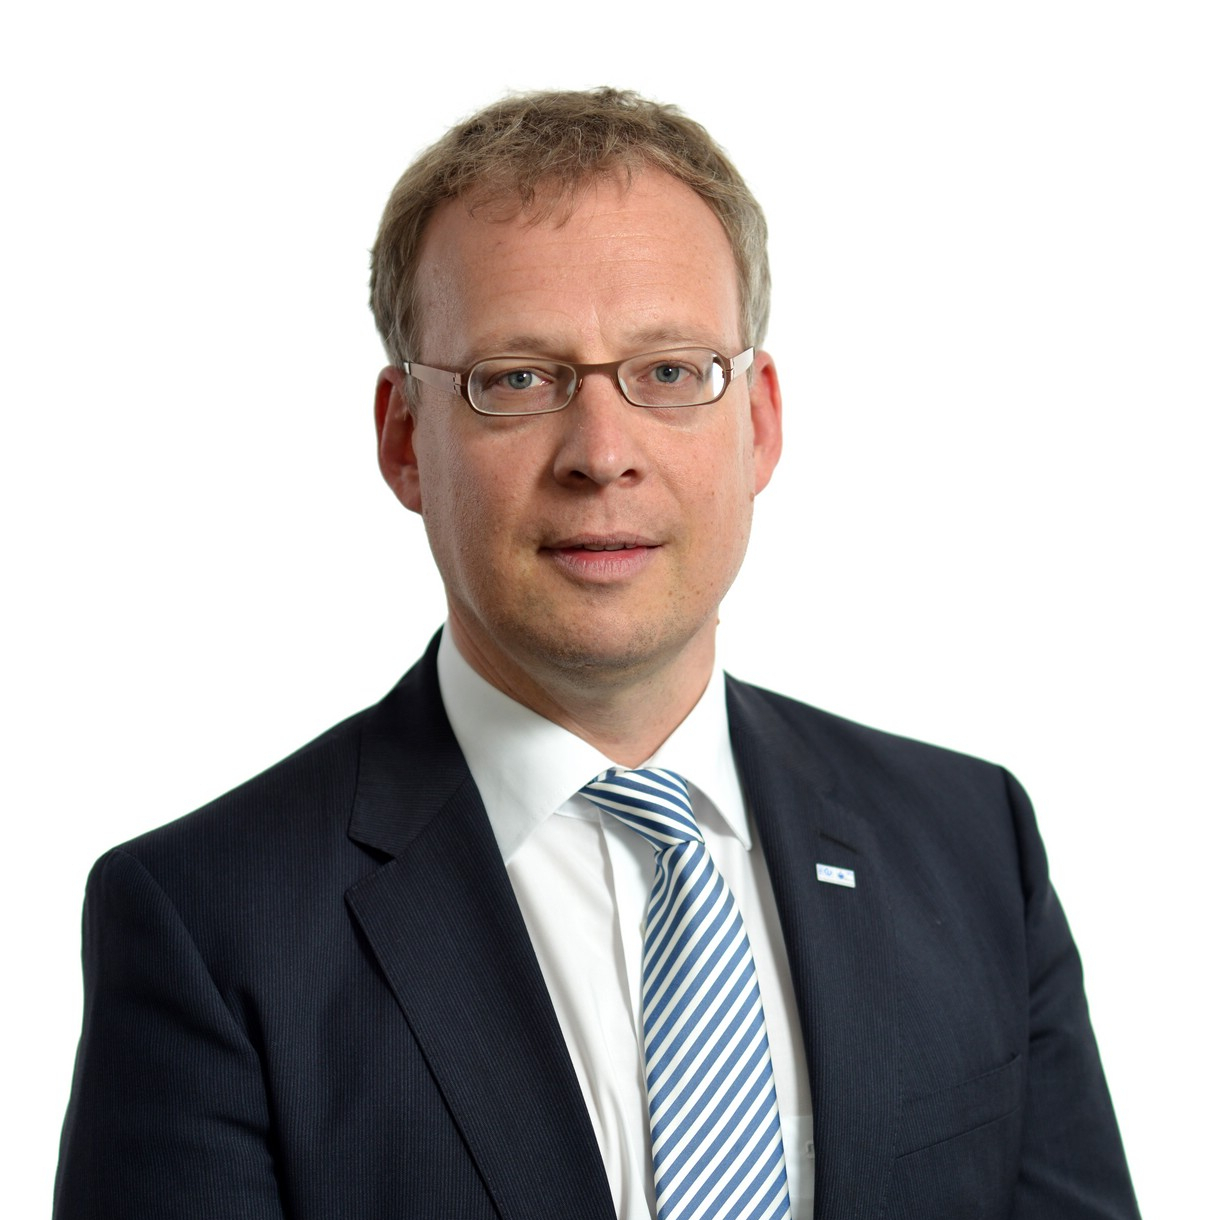 Peter Fürnthaler